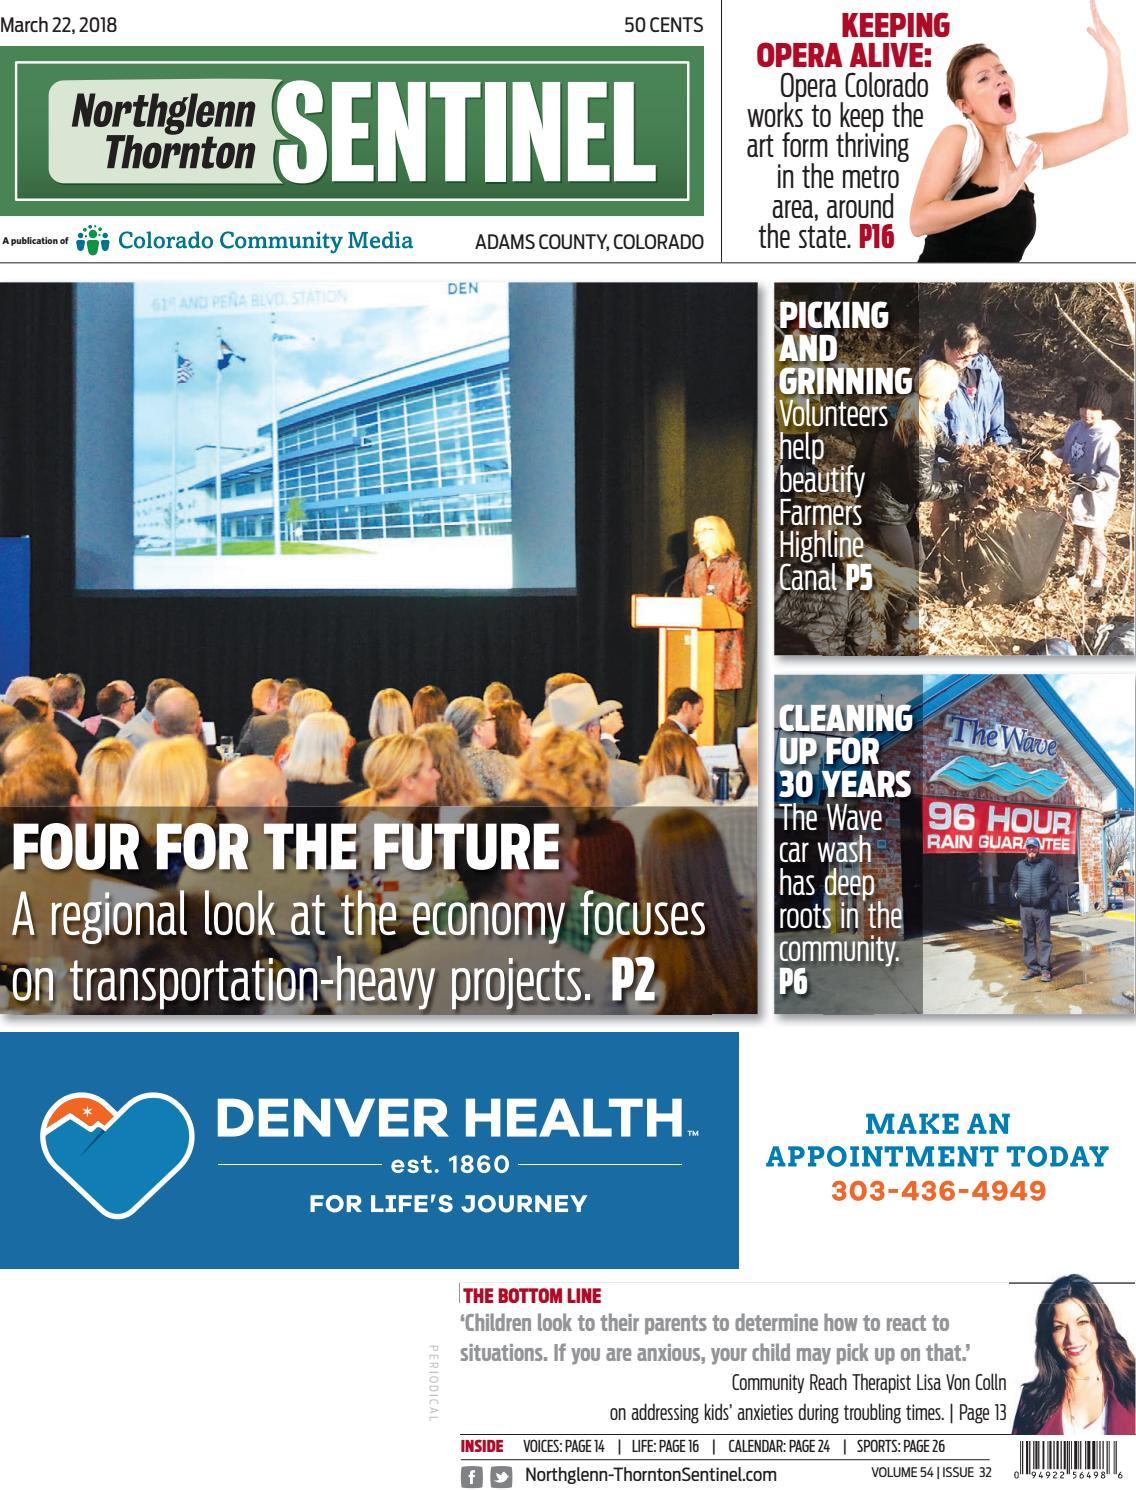 Northglenn Thornton Sentinel 0322 by Colorado Community Media - issuu